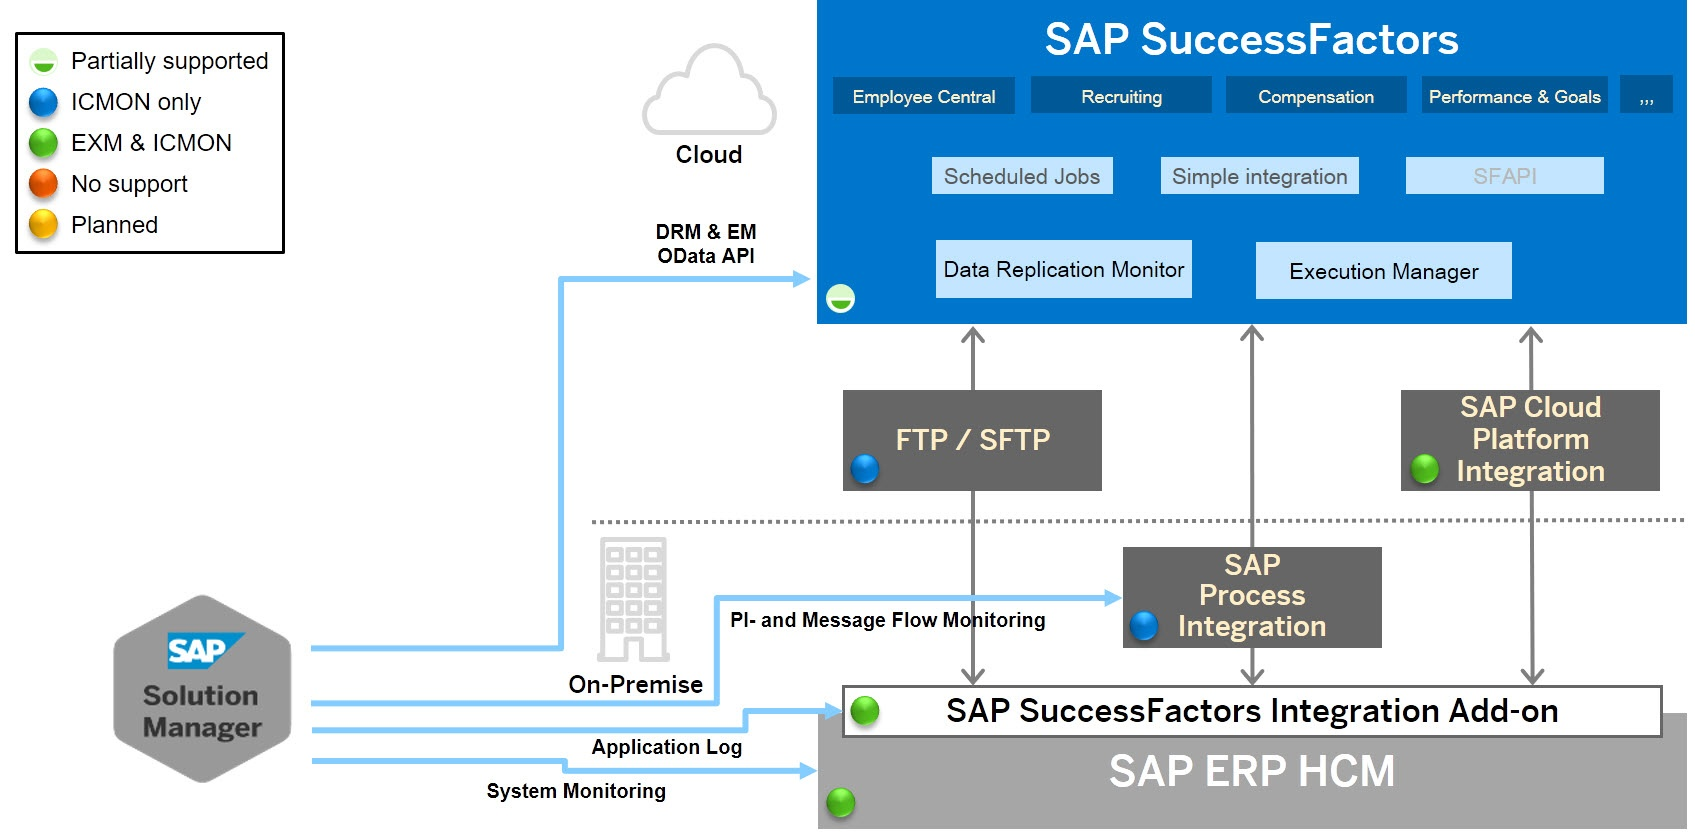 SAP SuccessFactors - Technical Operations - SCN Wiki